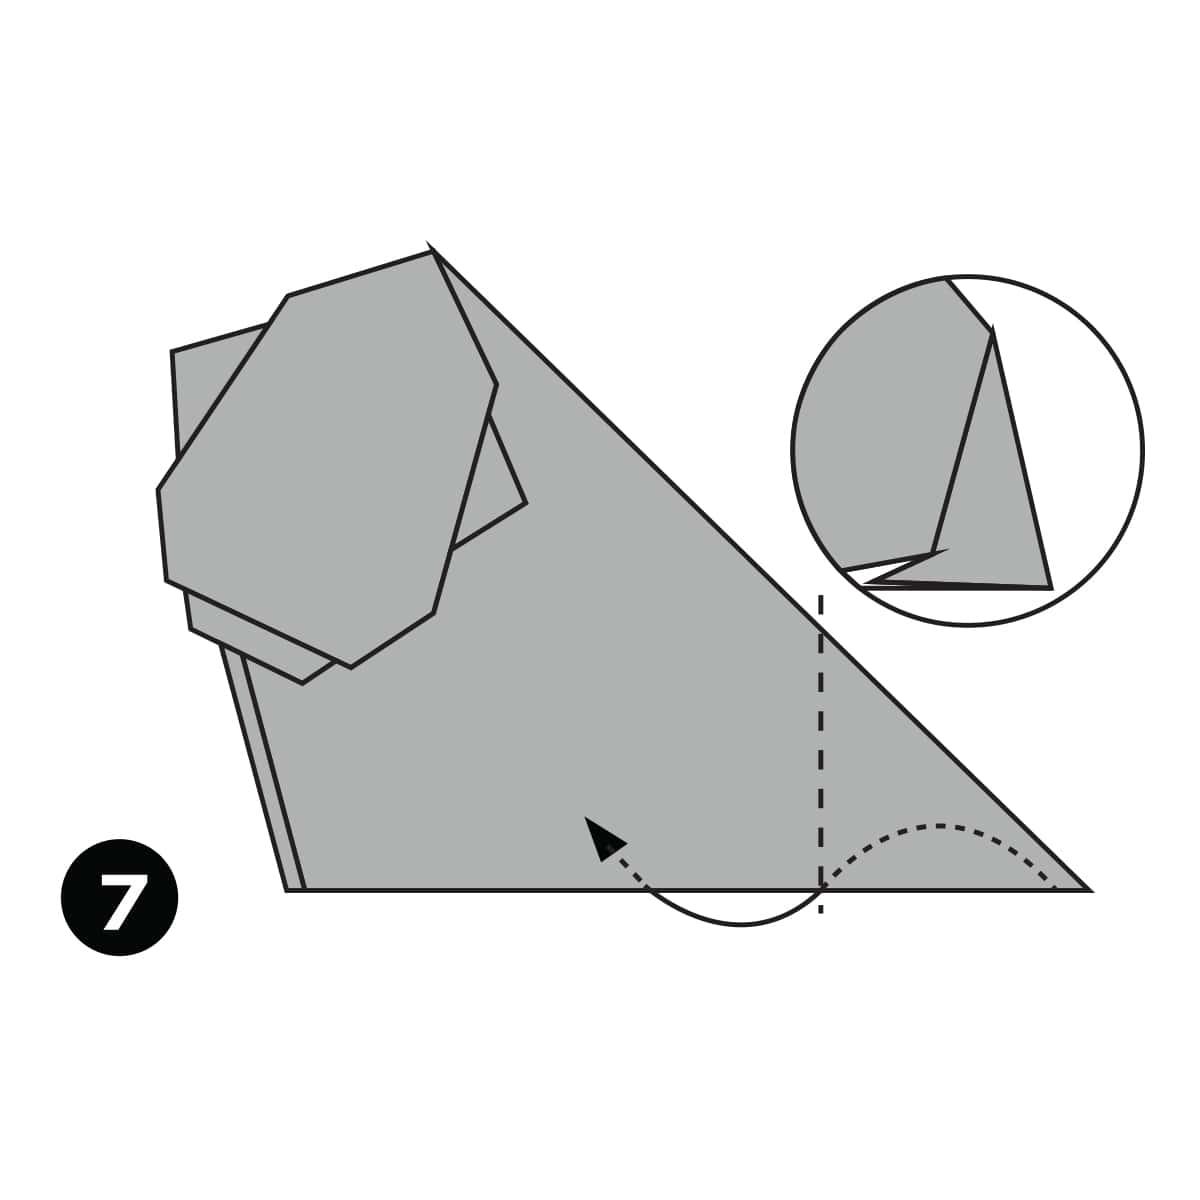 Hippo Step 7